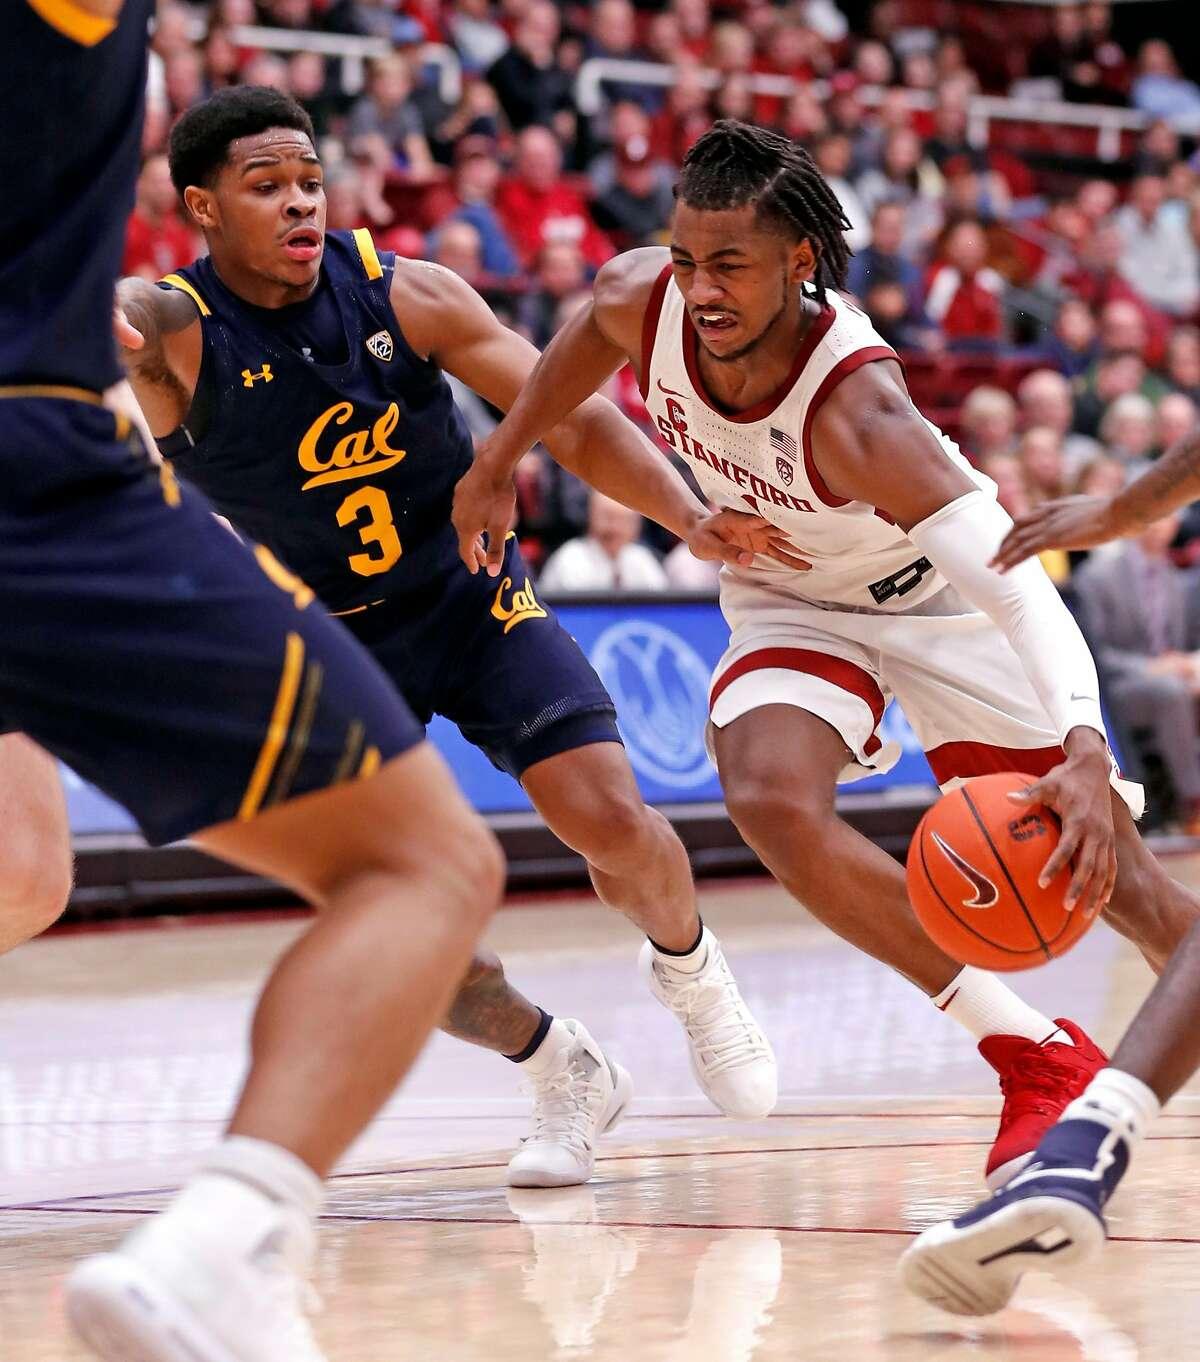 Stanford's Daejon Davis drives against California's Paris Austin in 1st half of Pac 12 men's basketball game at Maples Pavilion in Stanford, Calif., on Thursday, January 2, 2020..